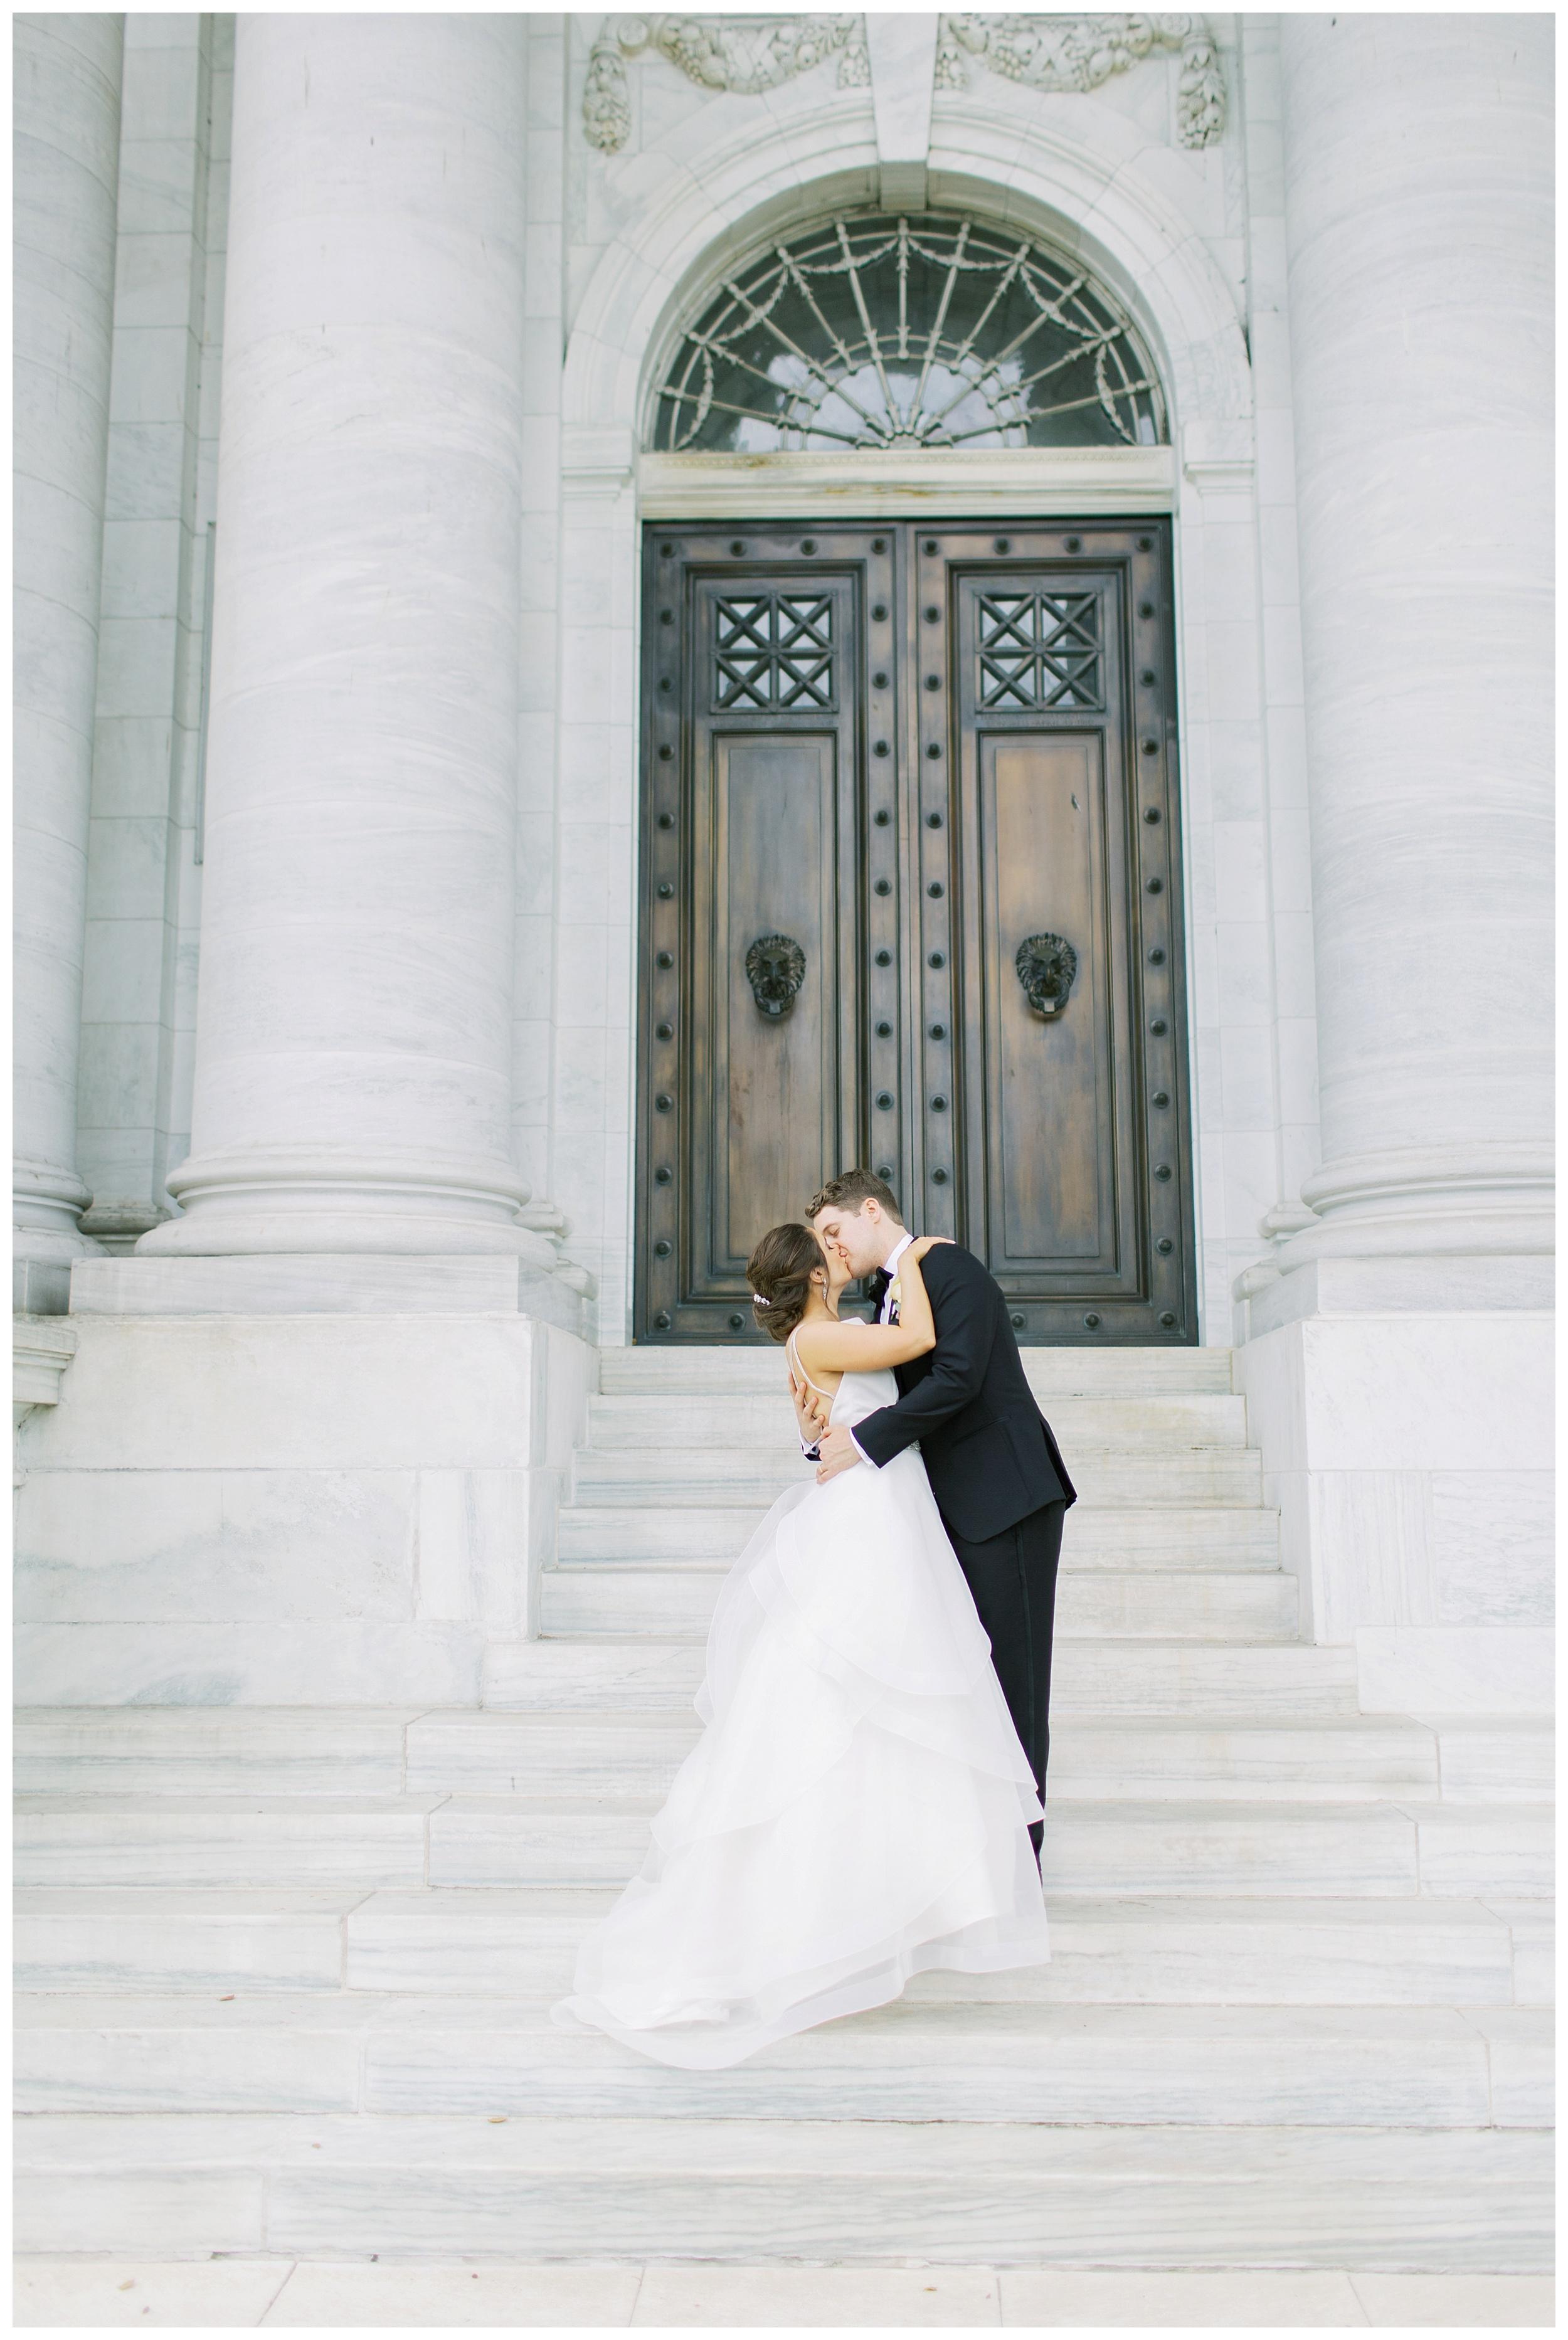 DAR Constitution Hall Wedding Wedding | Daughters of the American Revolution Wedding | District of Columbia Film Wedding Photographer Kir Tuben_0102.jpg